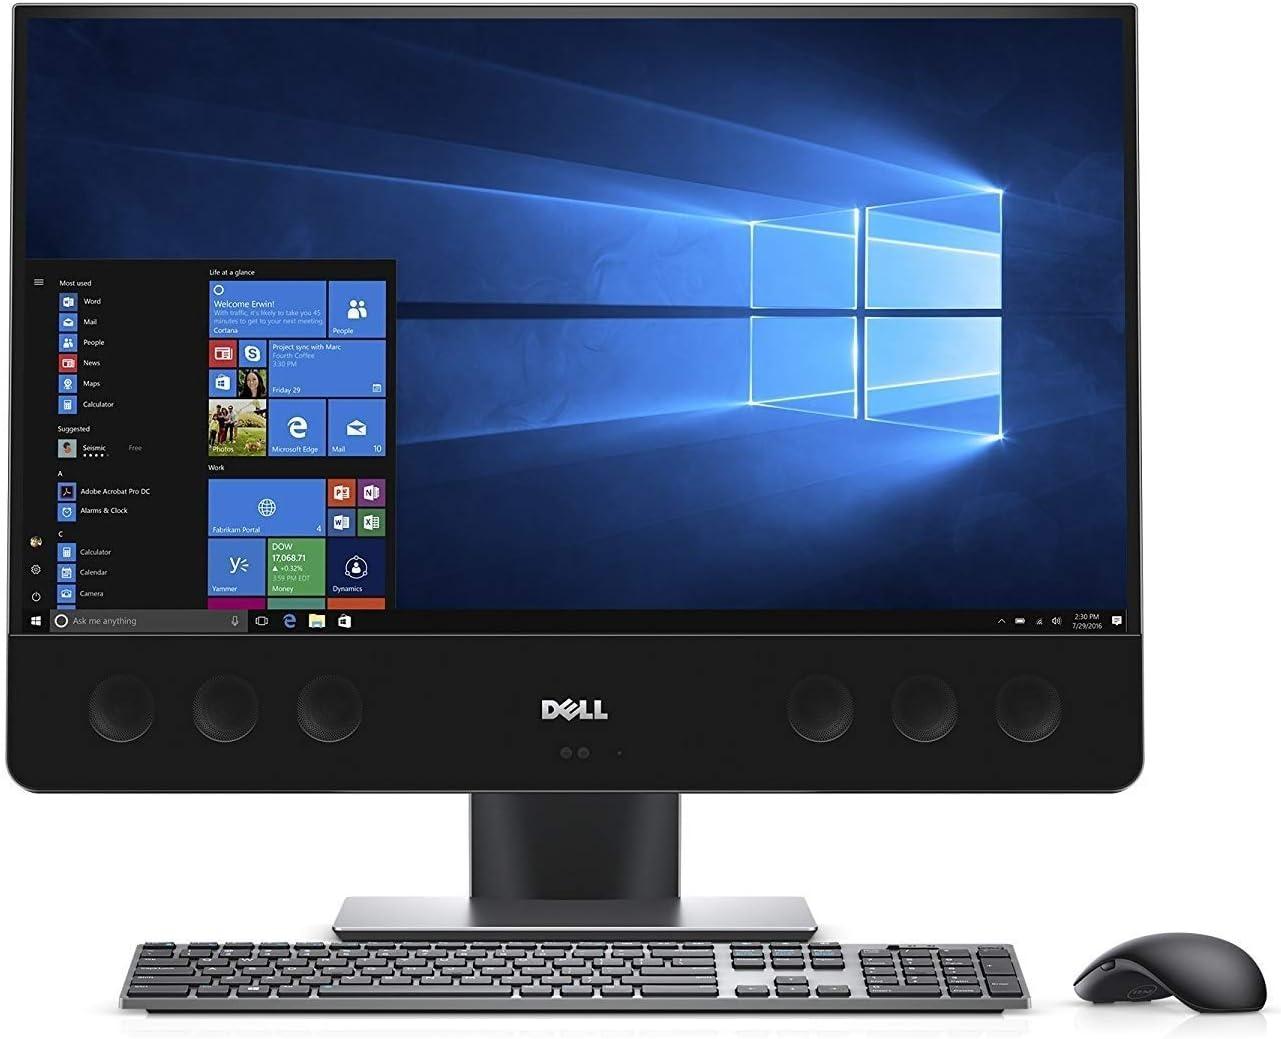 "Dell XPS 7760 27"" Touchscreen Intel Core i5-7400 X4 3GHz 8GB 1TB + 256GB Win10, Silver (Renewed)"